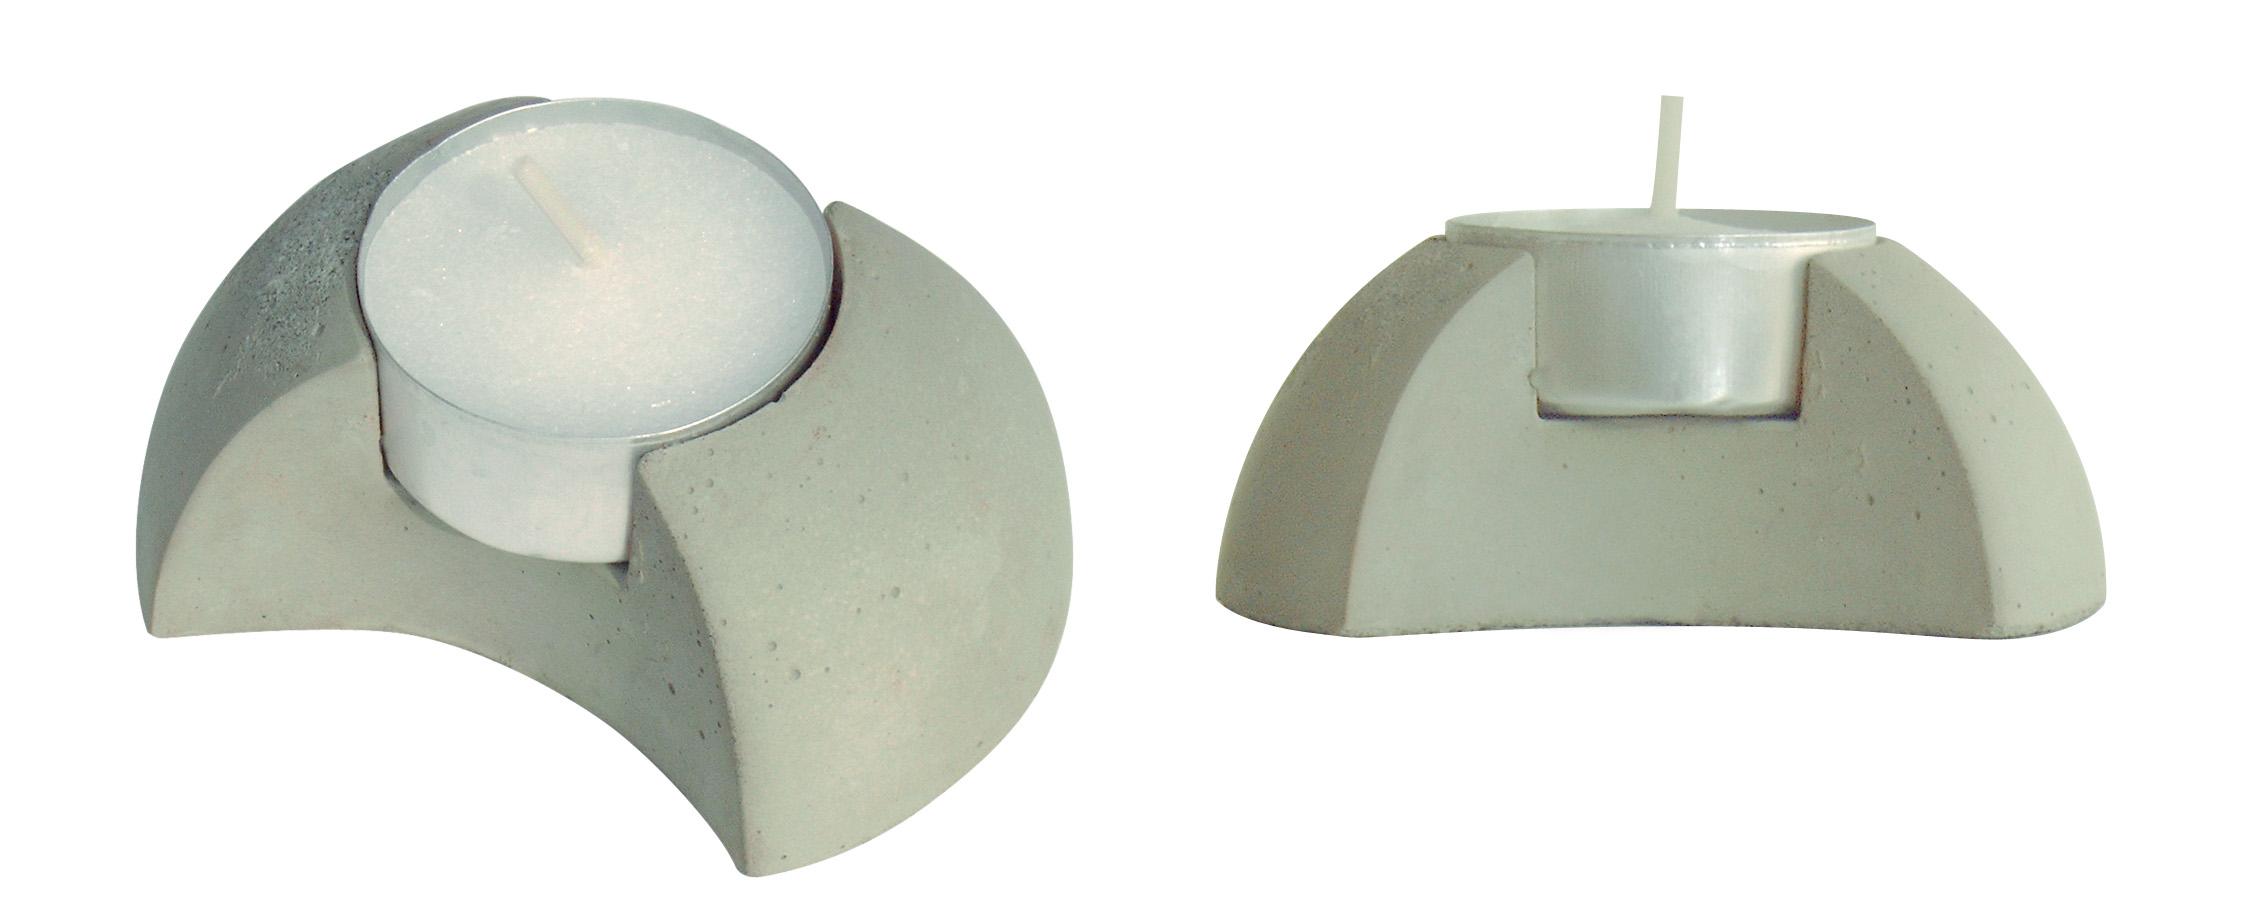 concrete candleholder sphere, theelichthouder van beton